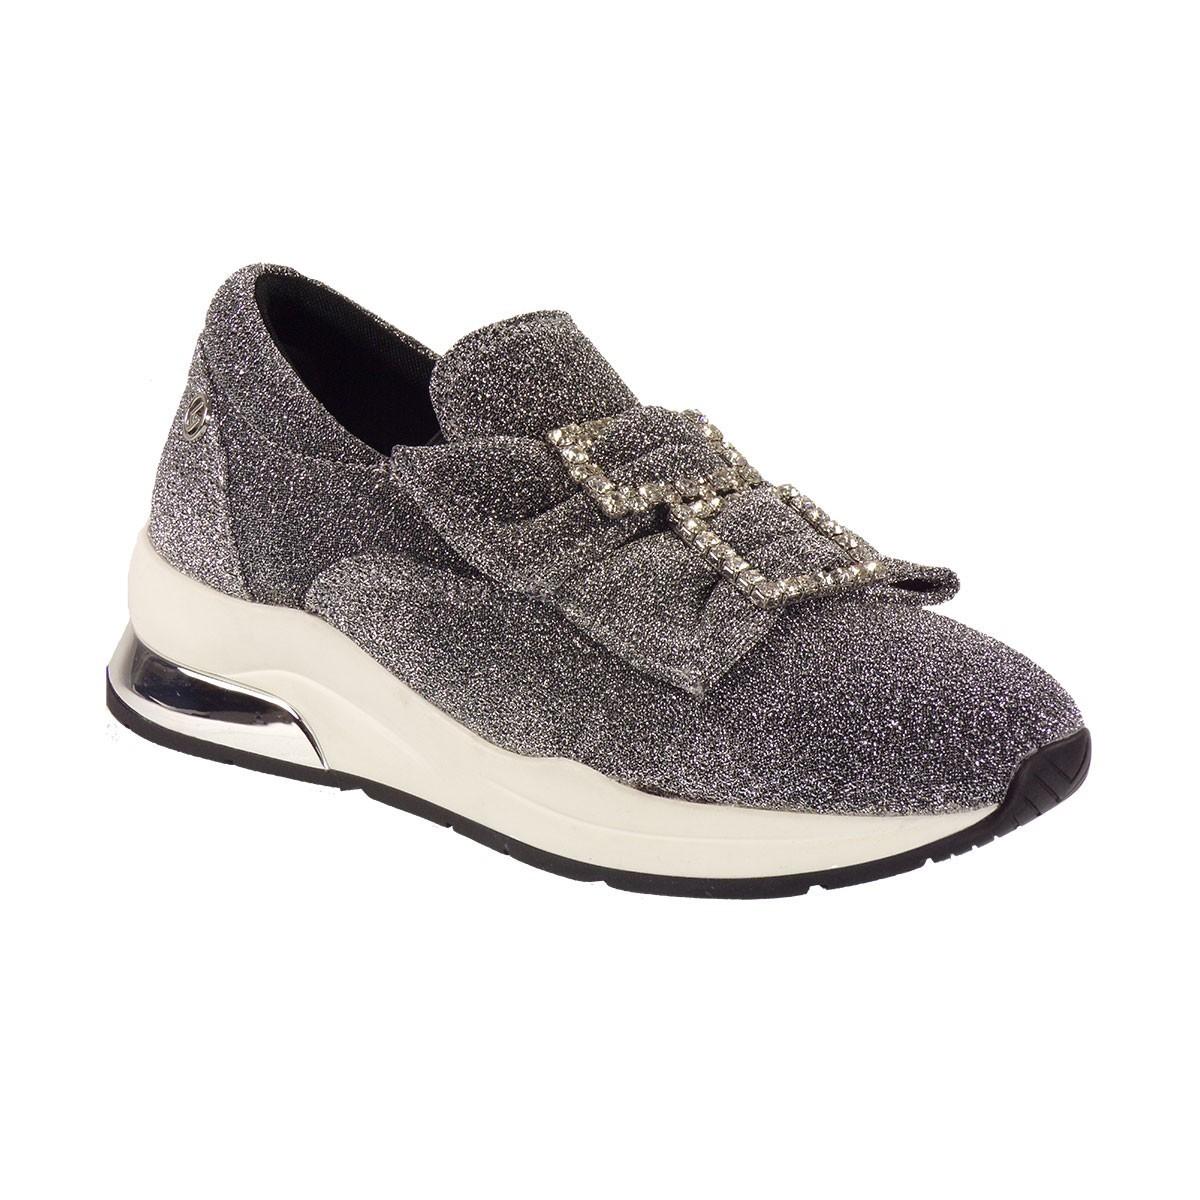 Liu-Jo Sneakers KARLIE 09 SLIP-ON Παπούτσια Γυναικεία B68011 Ασημί 00532